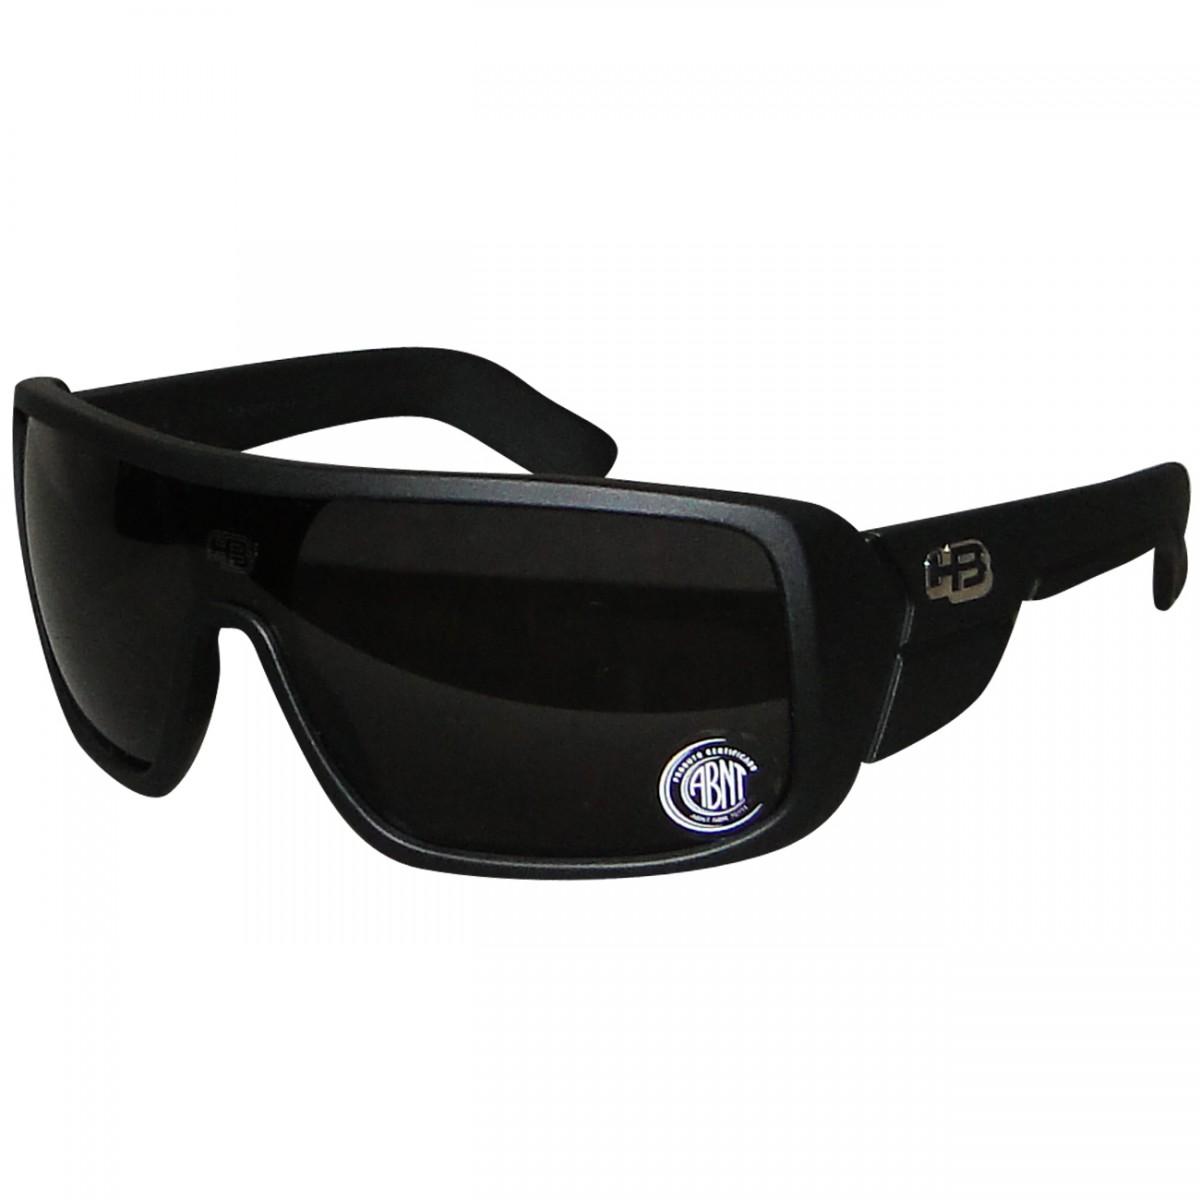 3e579c82d6ed9 Oculos HB Carvin 90087001 - Preto Fosco - Chuteira Nike, Adidas. Sandalias  Femininas